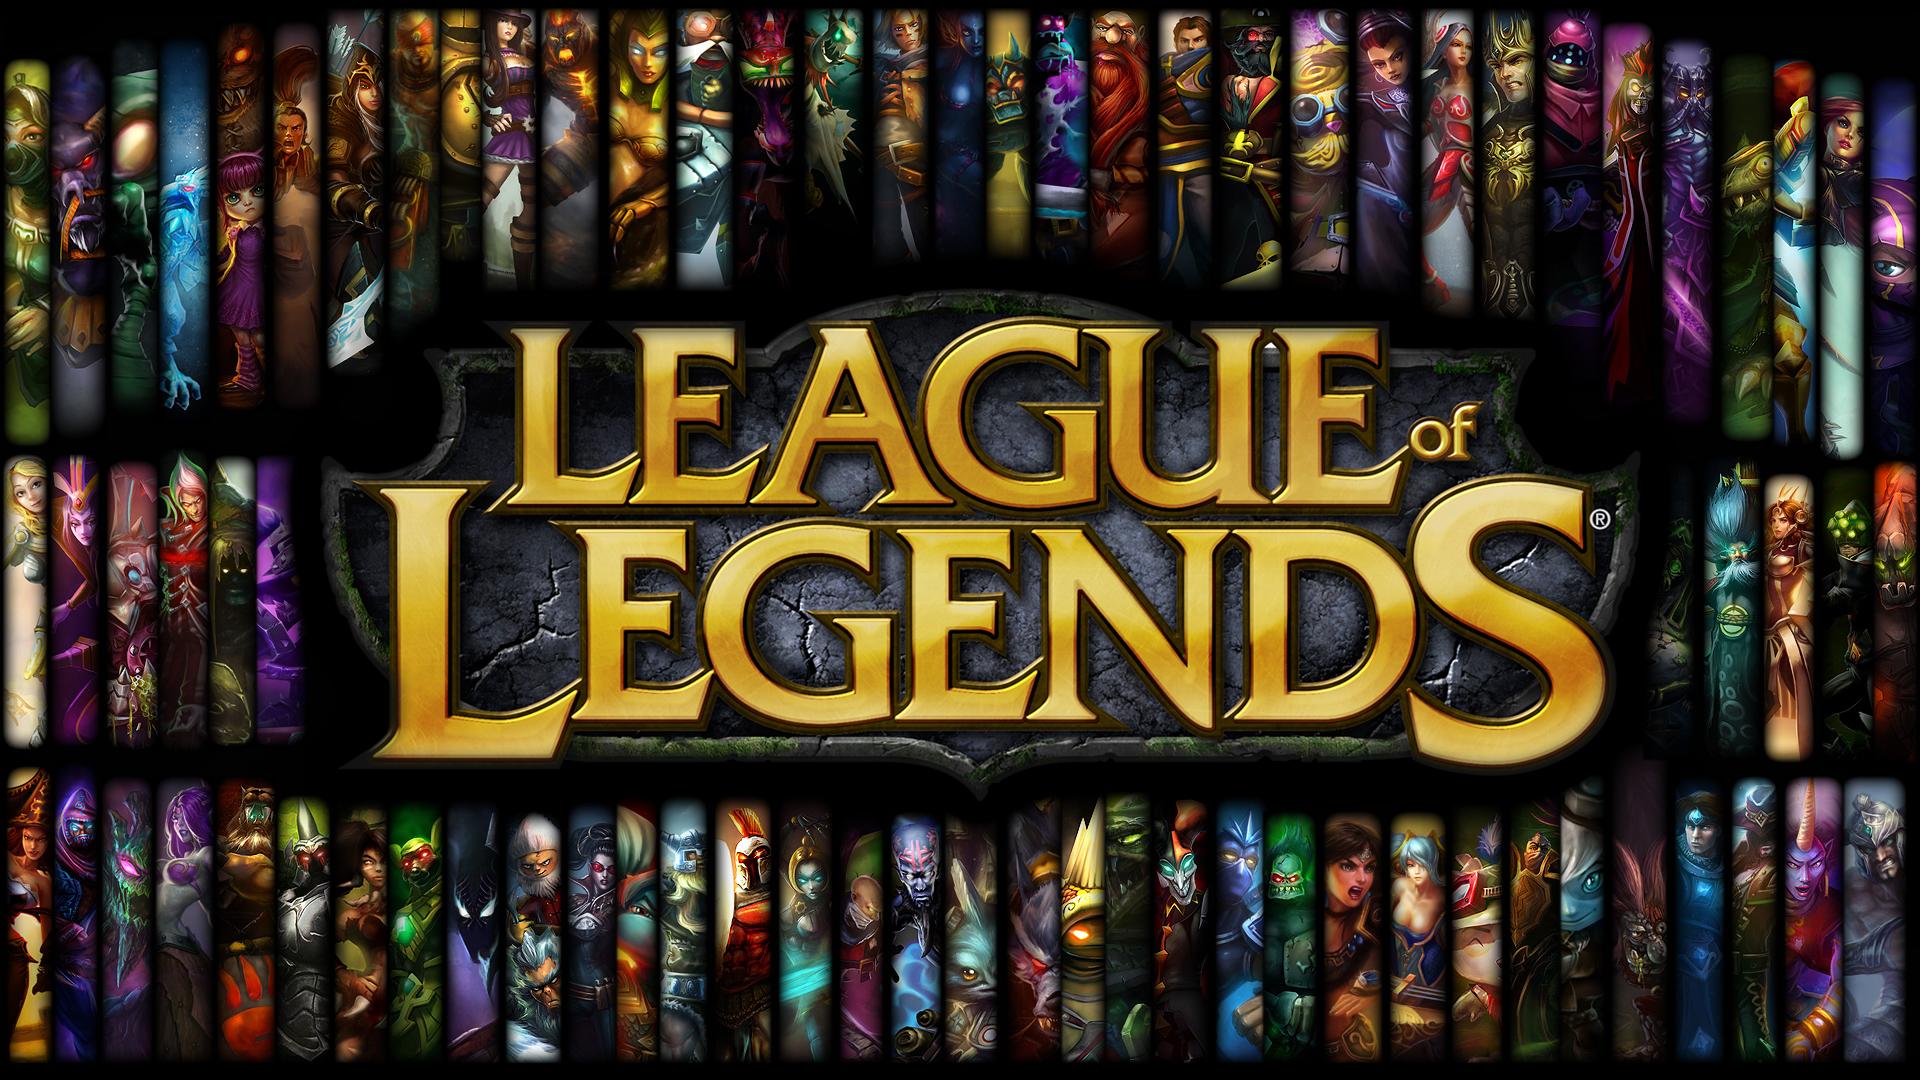 League of Legends Storm Desktop Background HD 1920x1080 | deskbg com